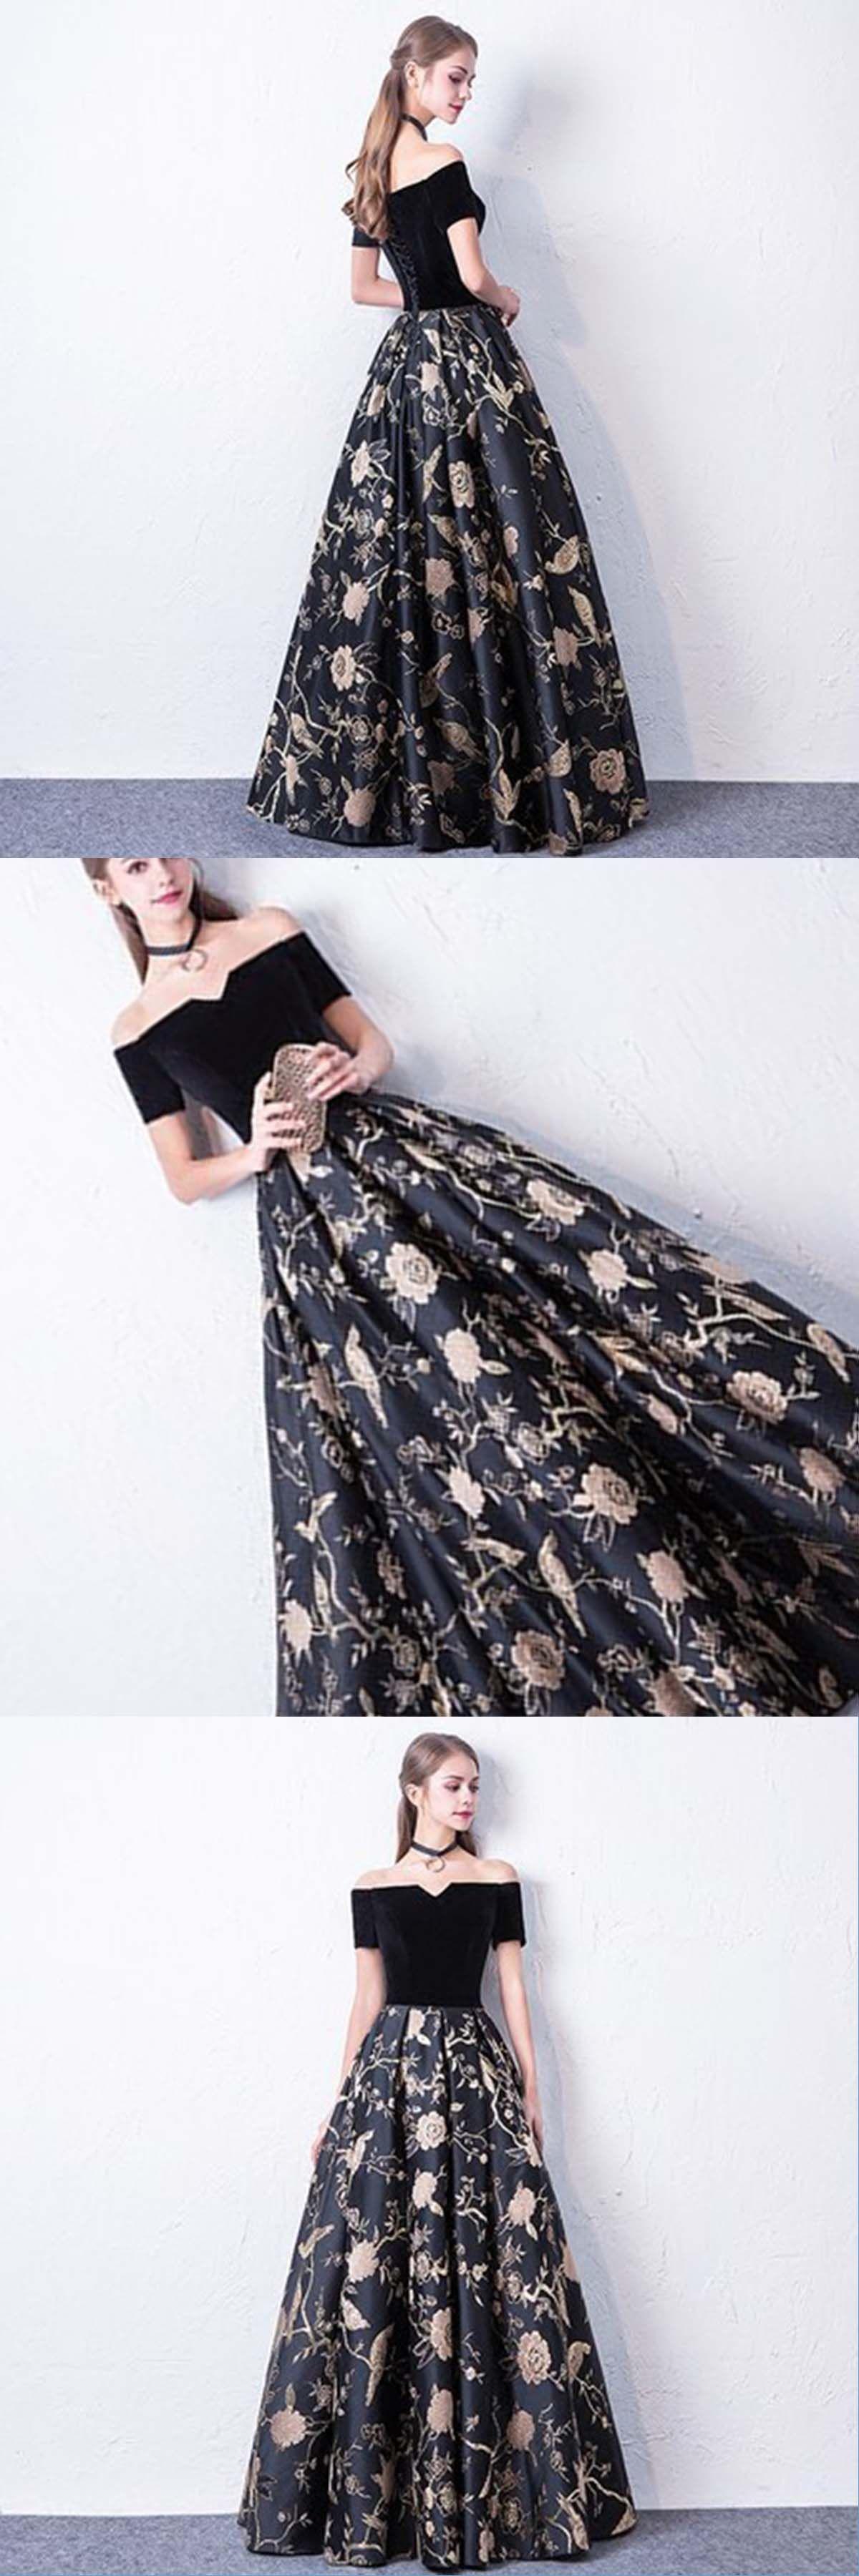 Black floral print satin long strapless evening dress with short